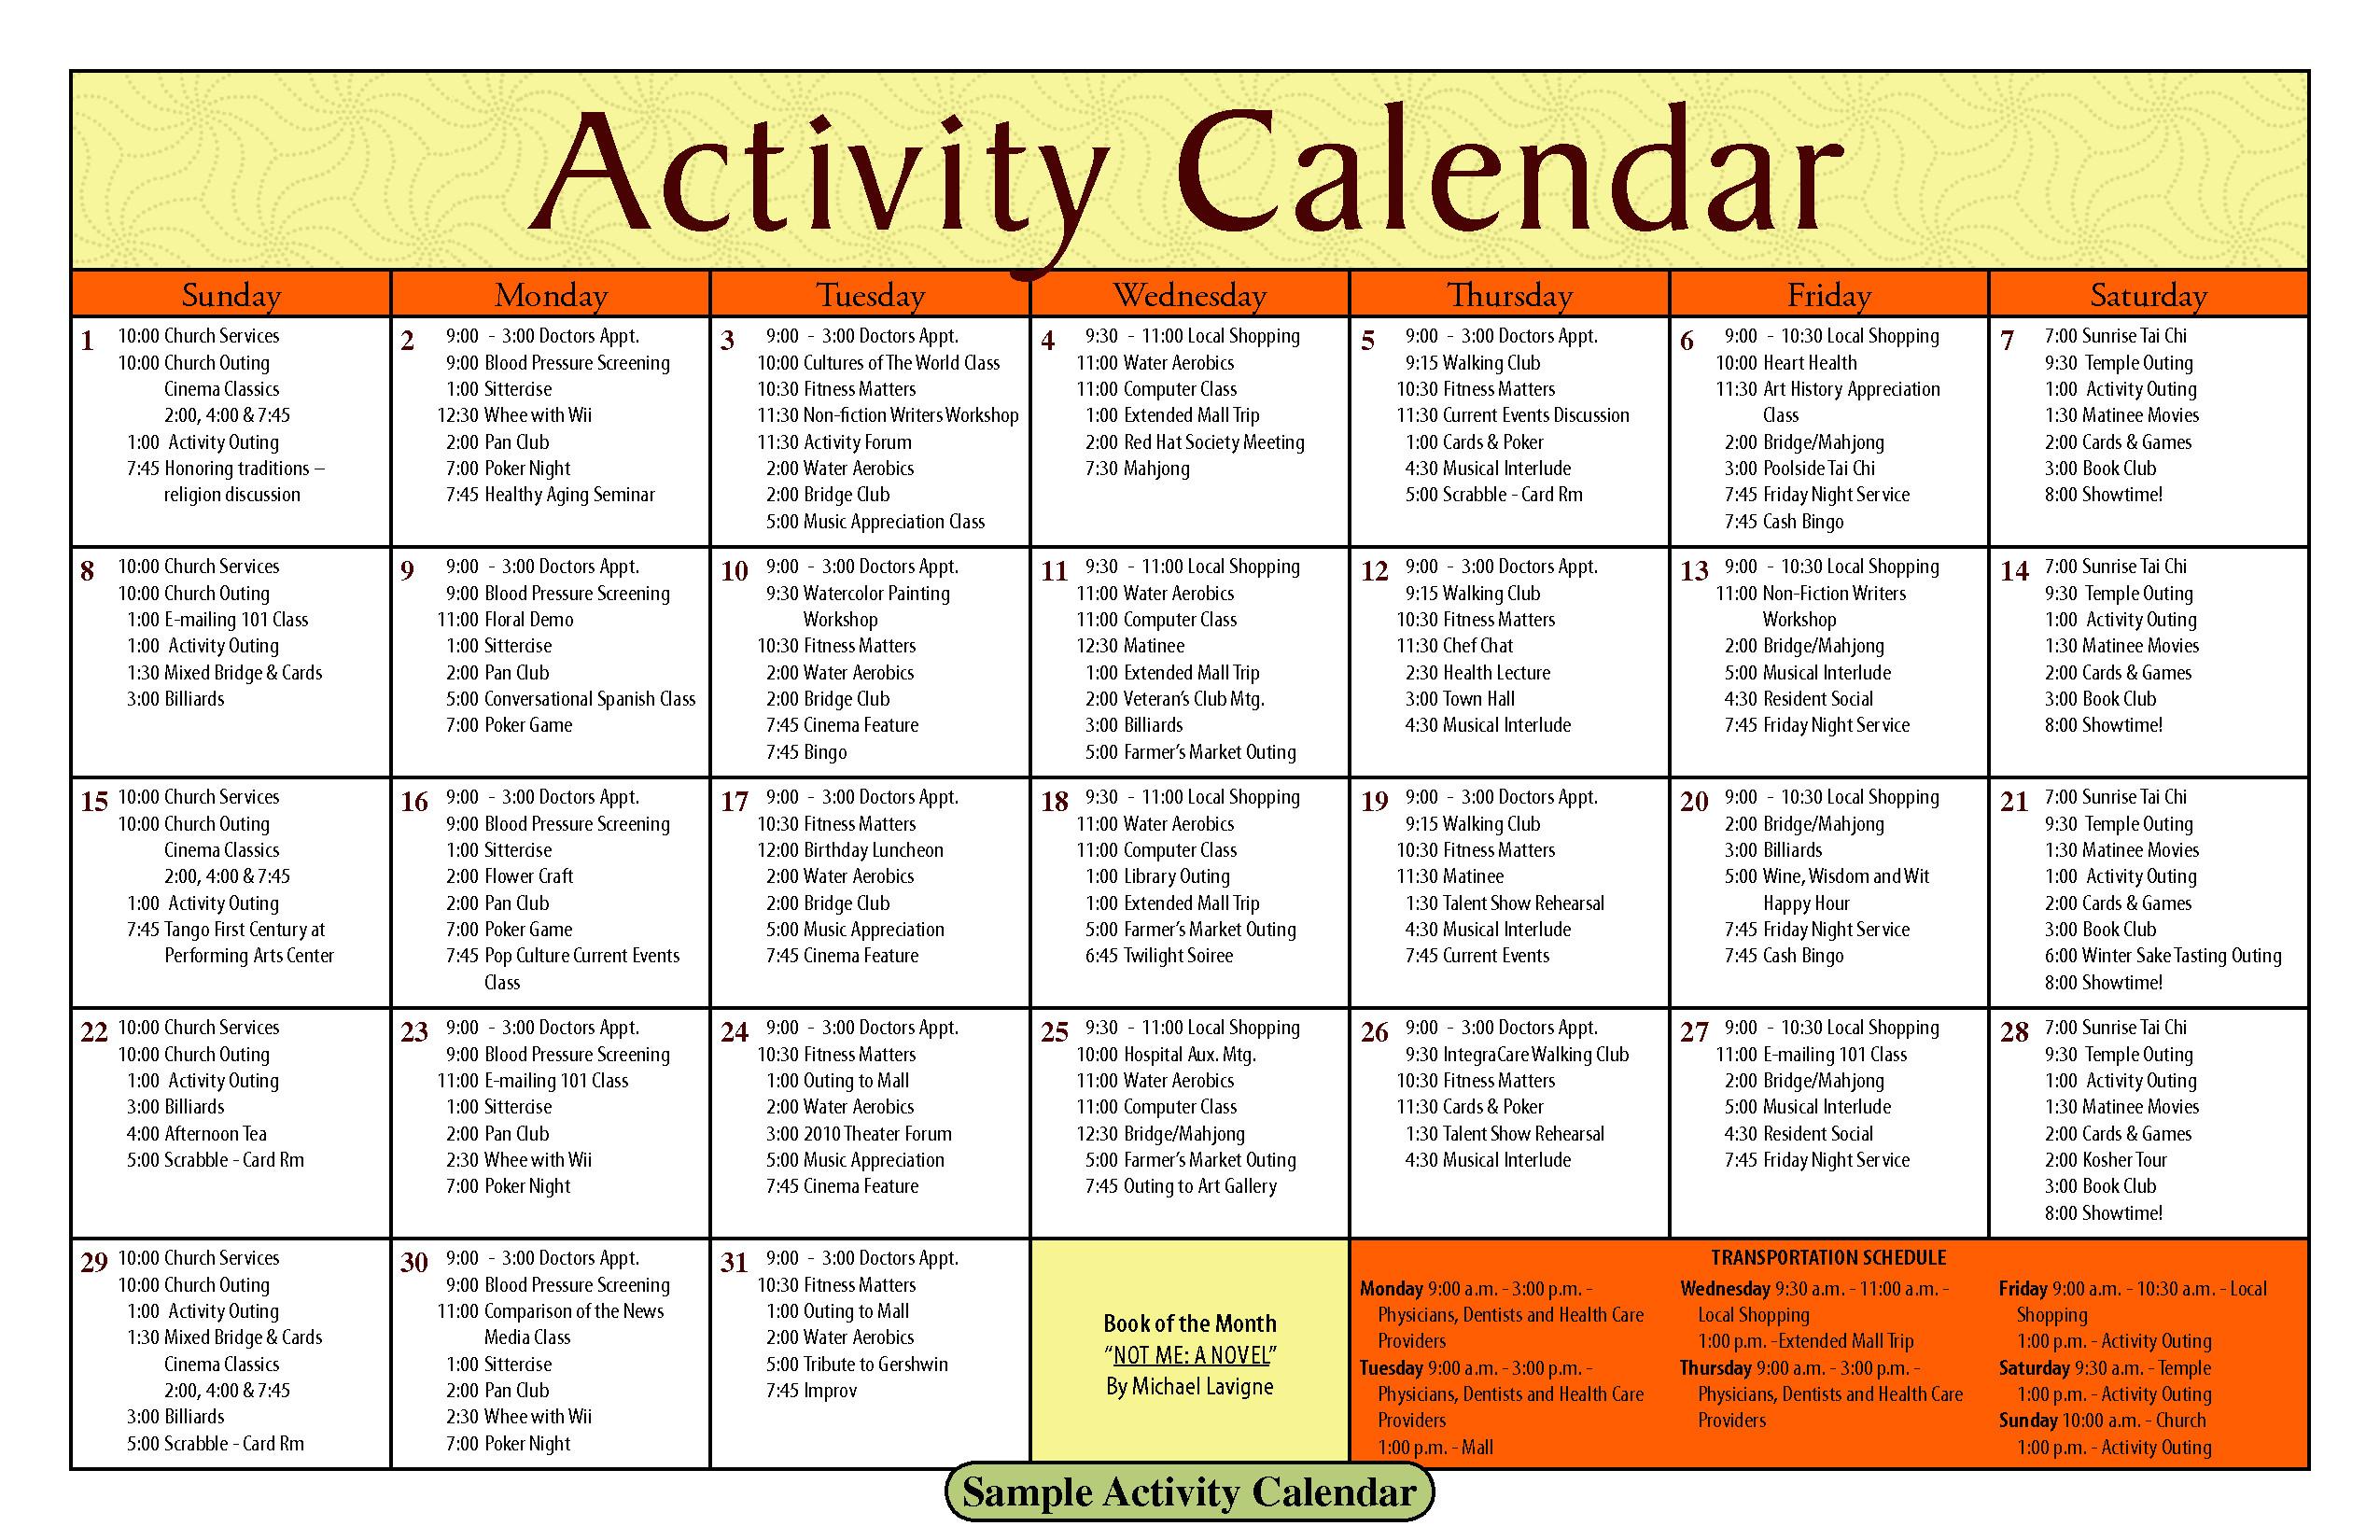 post blank activity calendar template 148313